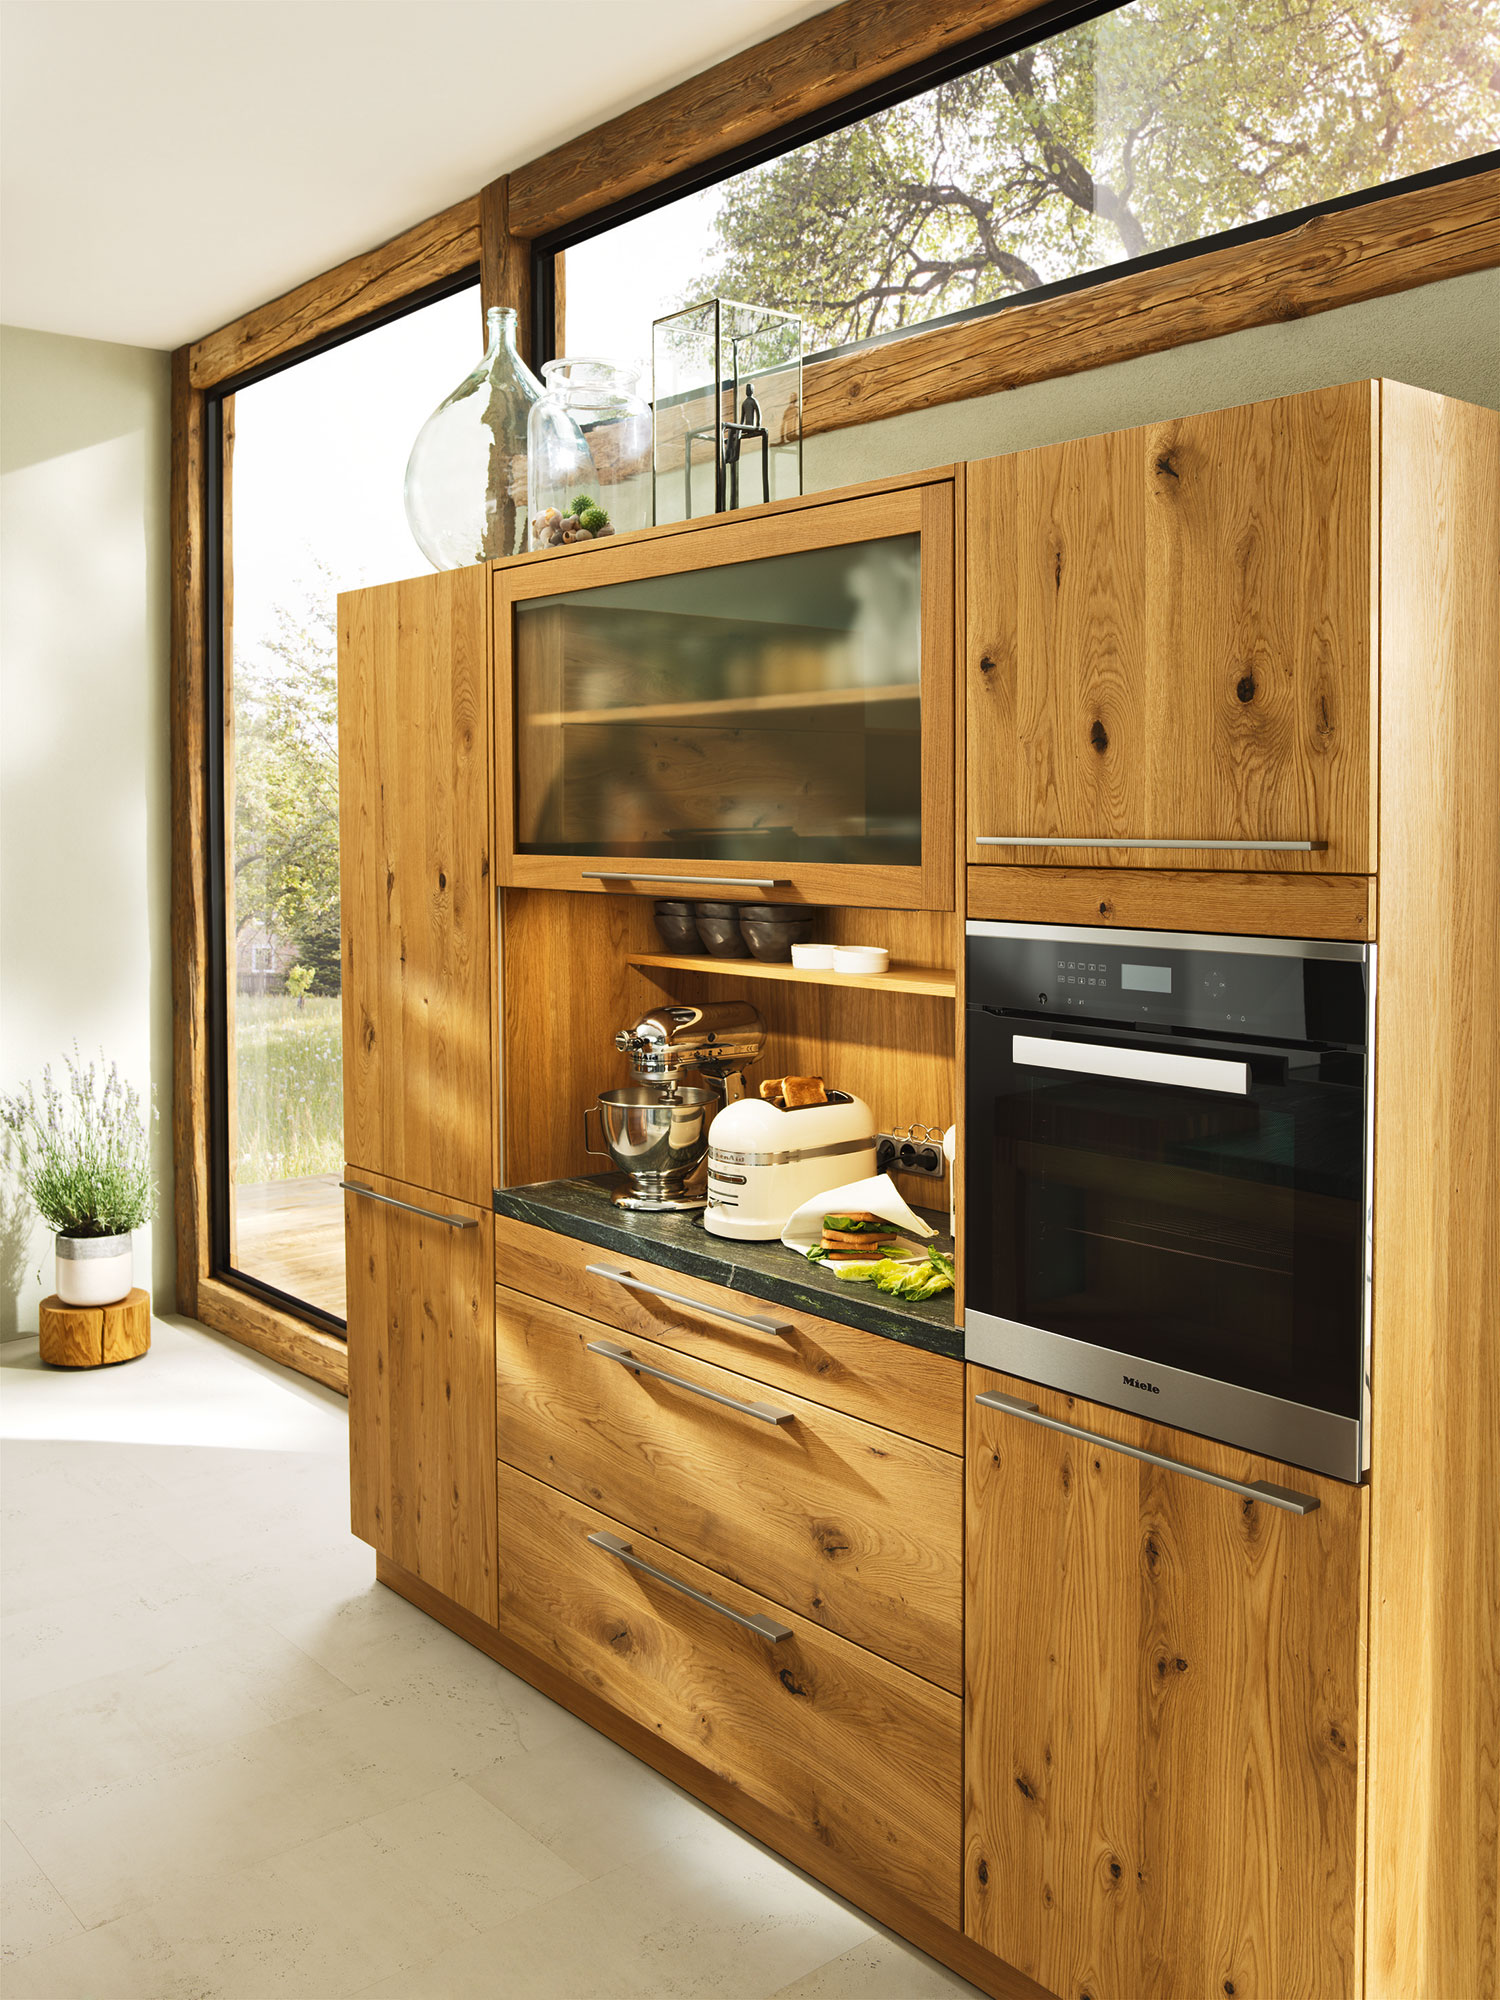 Holzküchen erle  TEAM 7 Naturholzküche Loft bei BÖHM Interieur